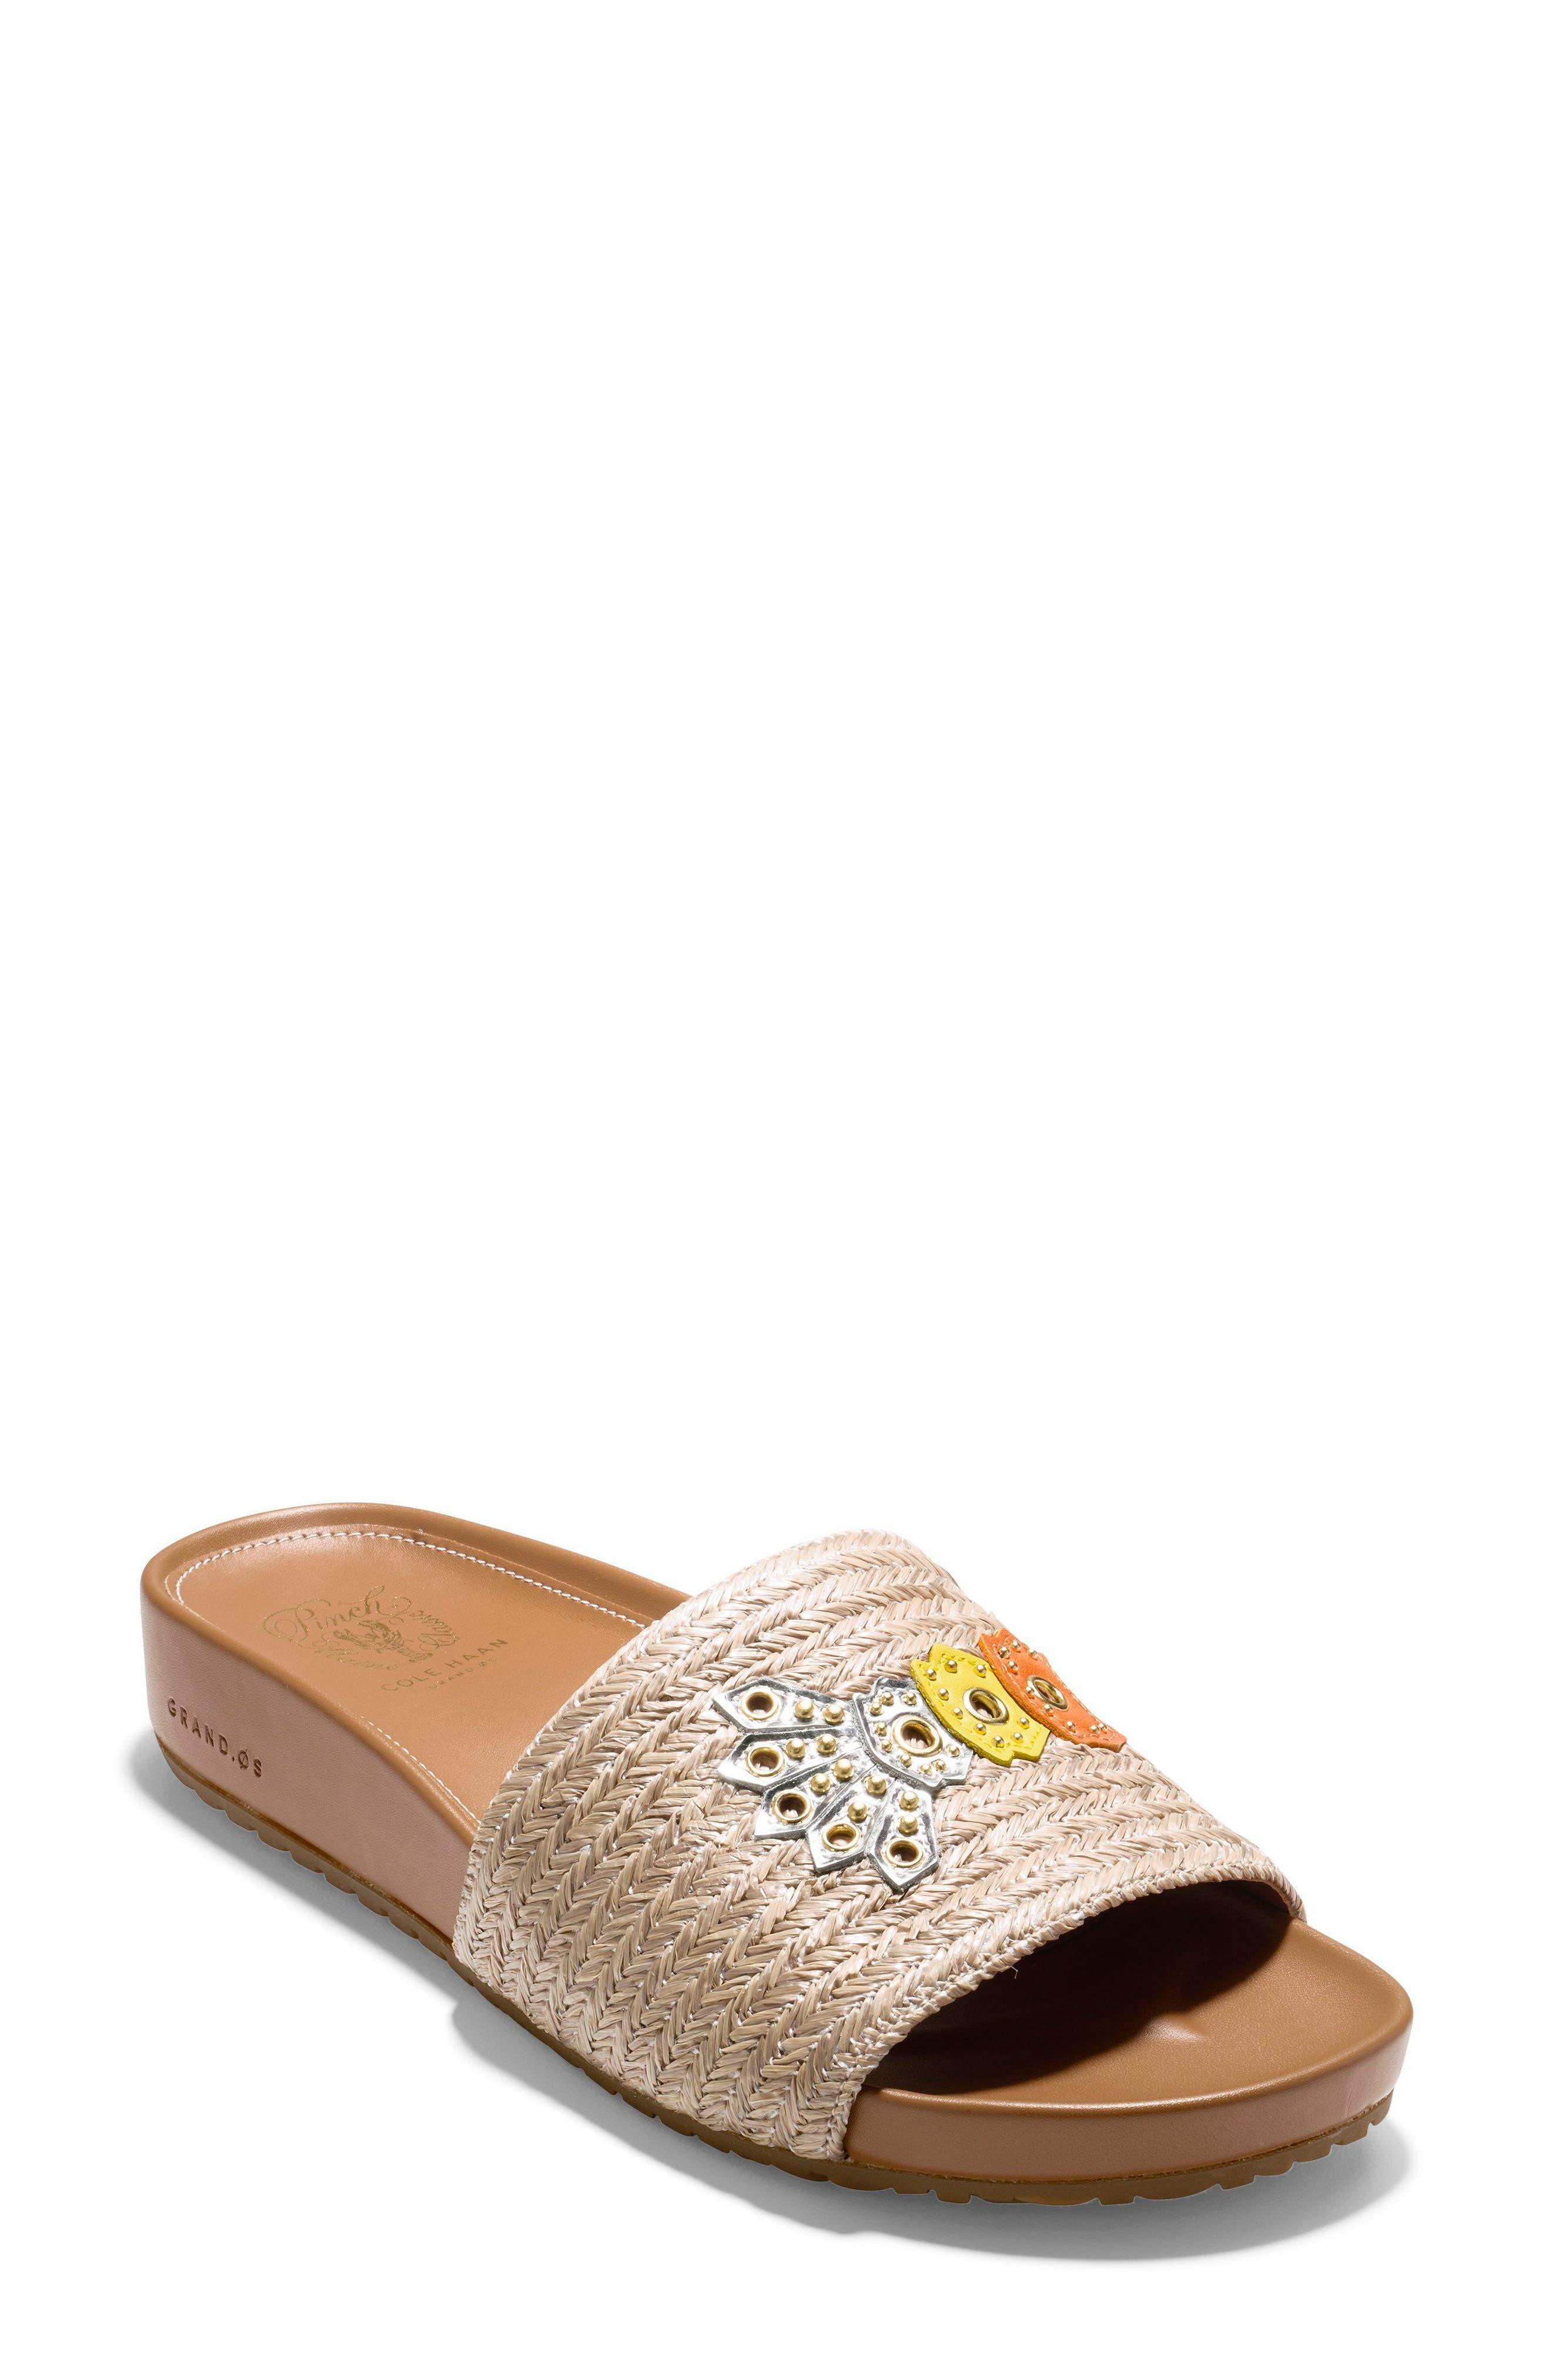 Pinch Montauk Lobster Slide Sandal,                             Main thumbnail 3, color,